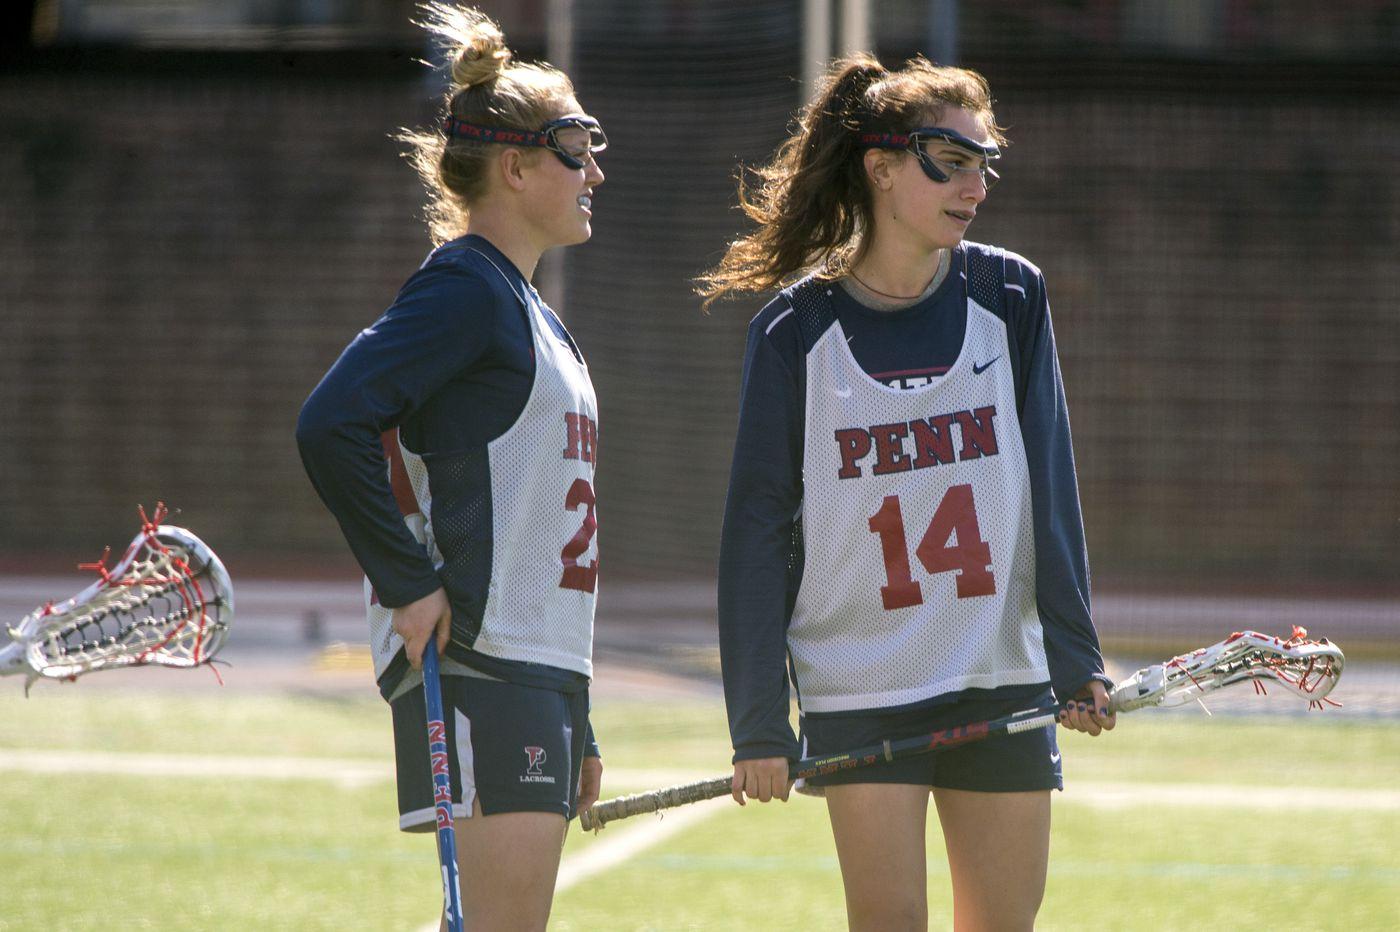 Penn women's lacrosse team will make 13th straight NCAA Tournament appearance